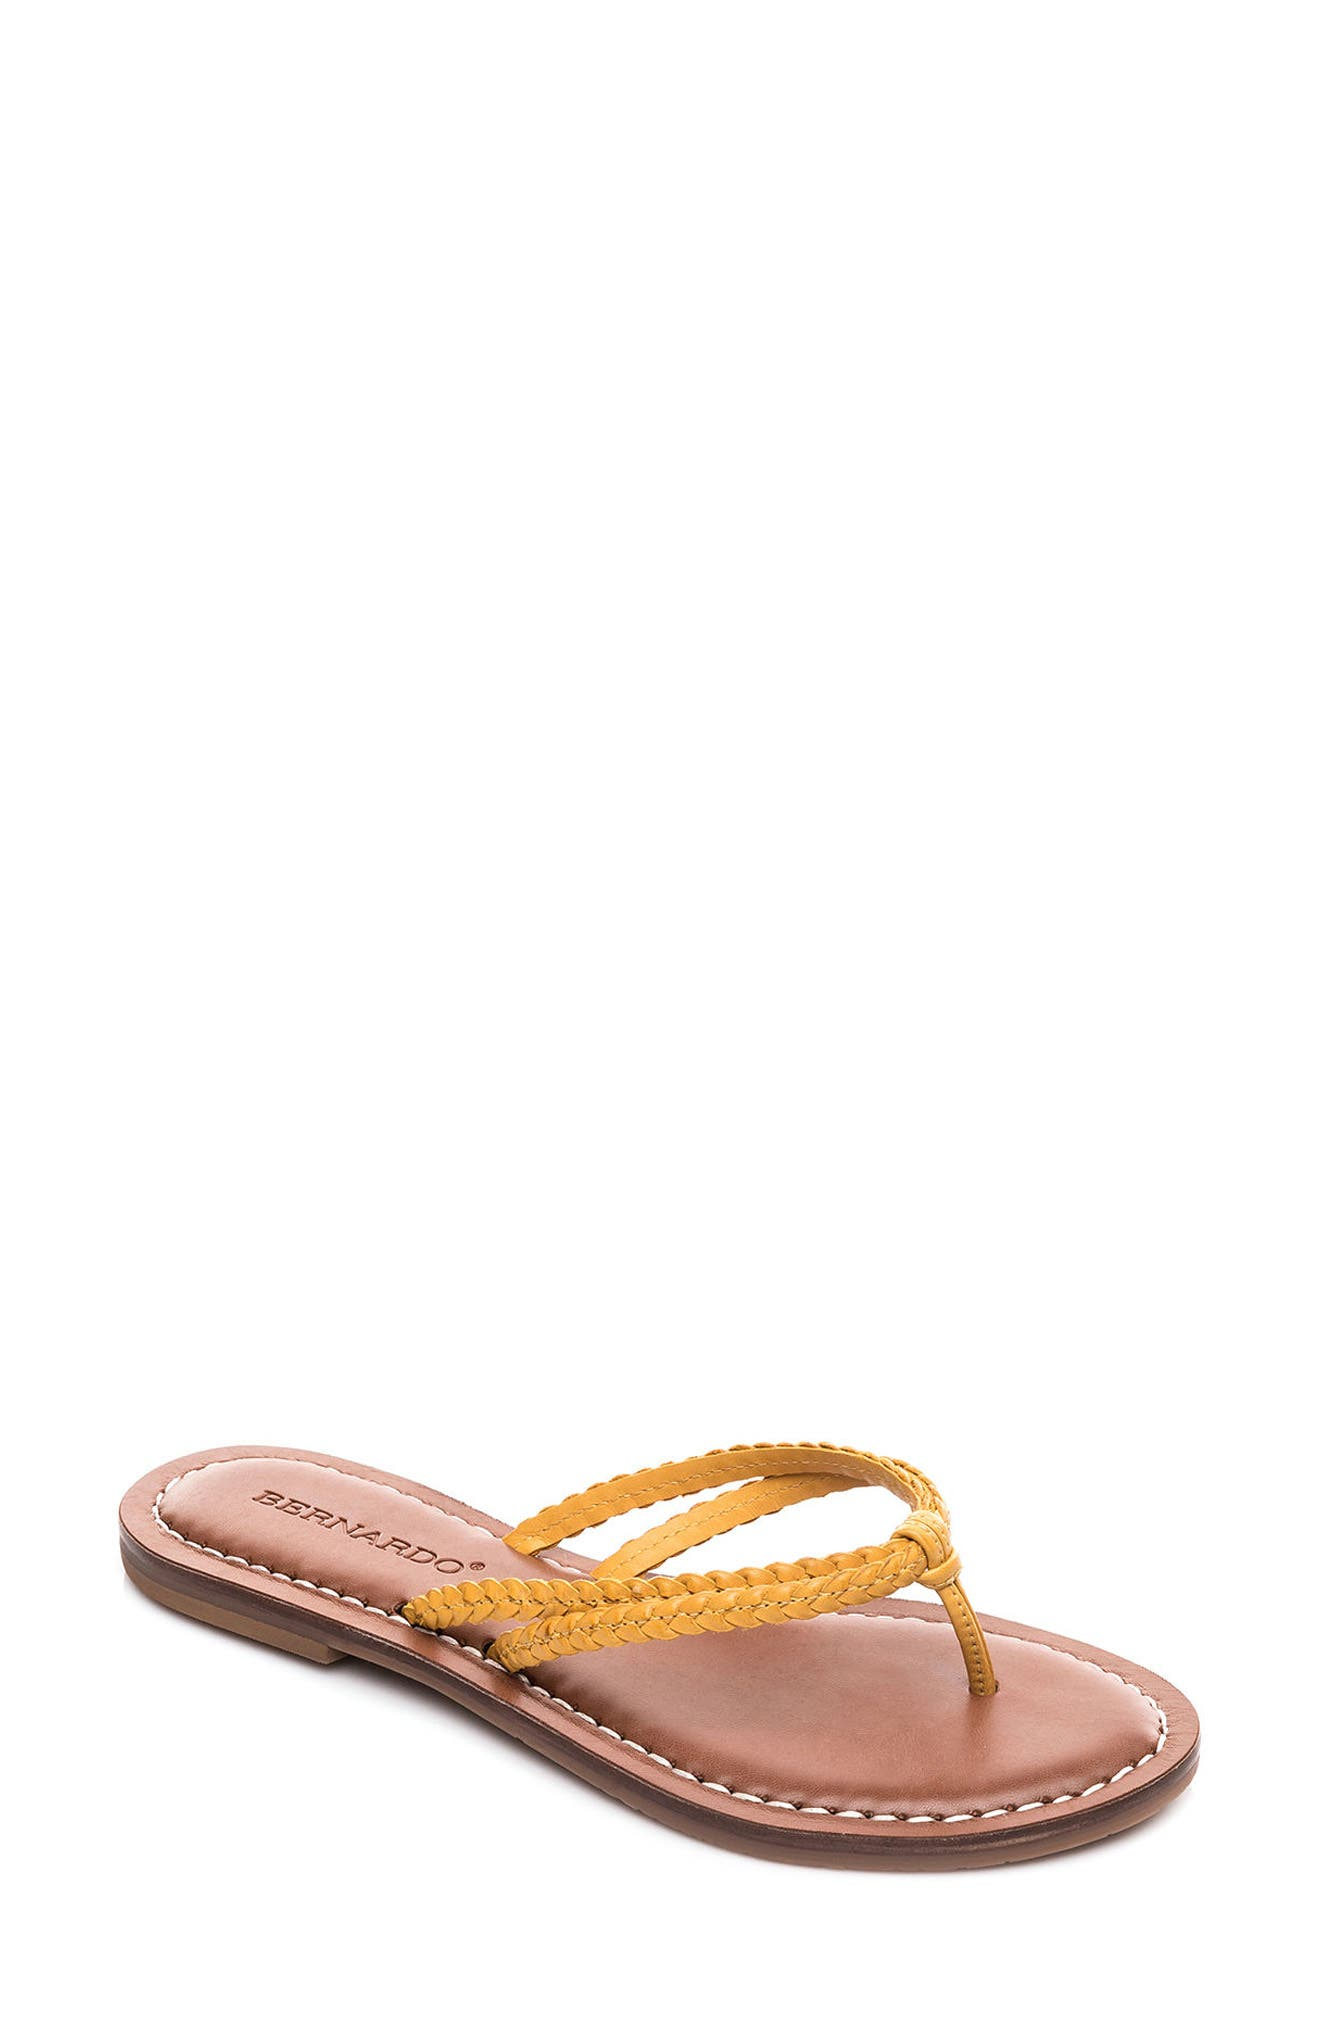 Bernardo Greta Braided Strap Sandal,                         Main,                         color, Golden Yellow Leather